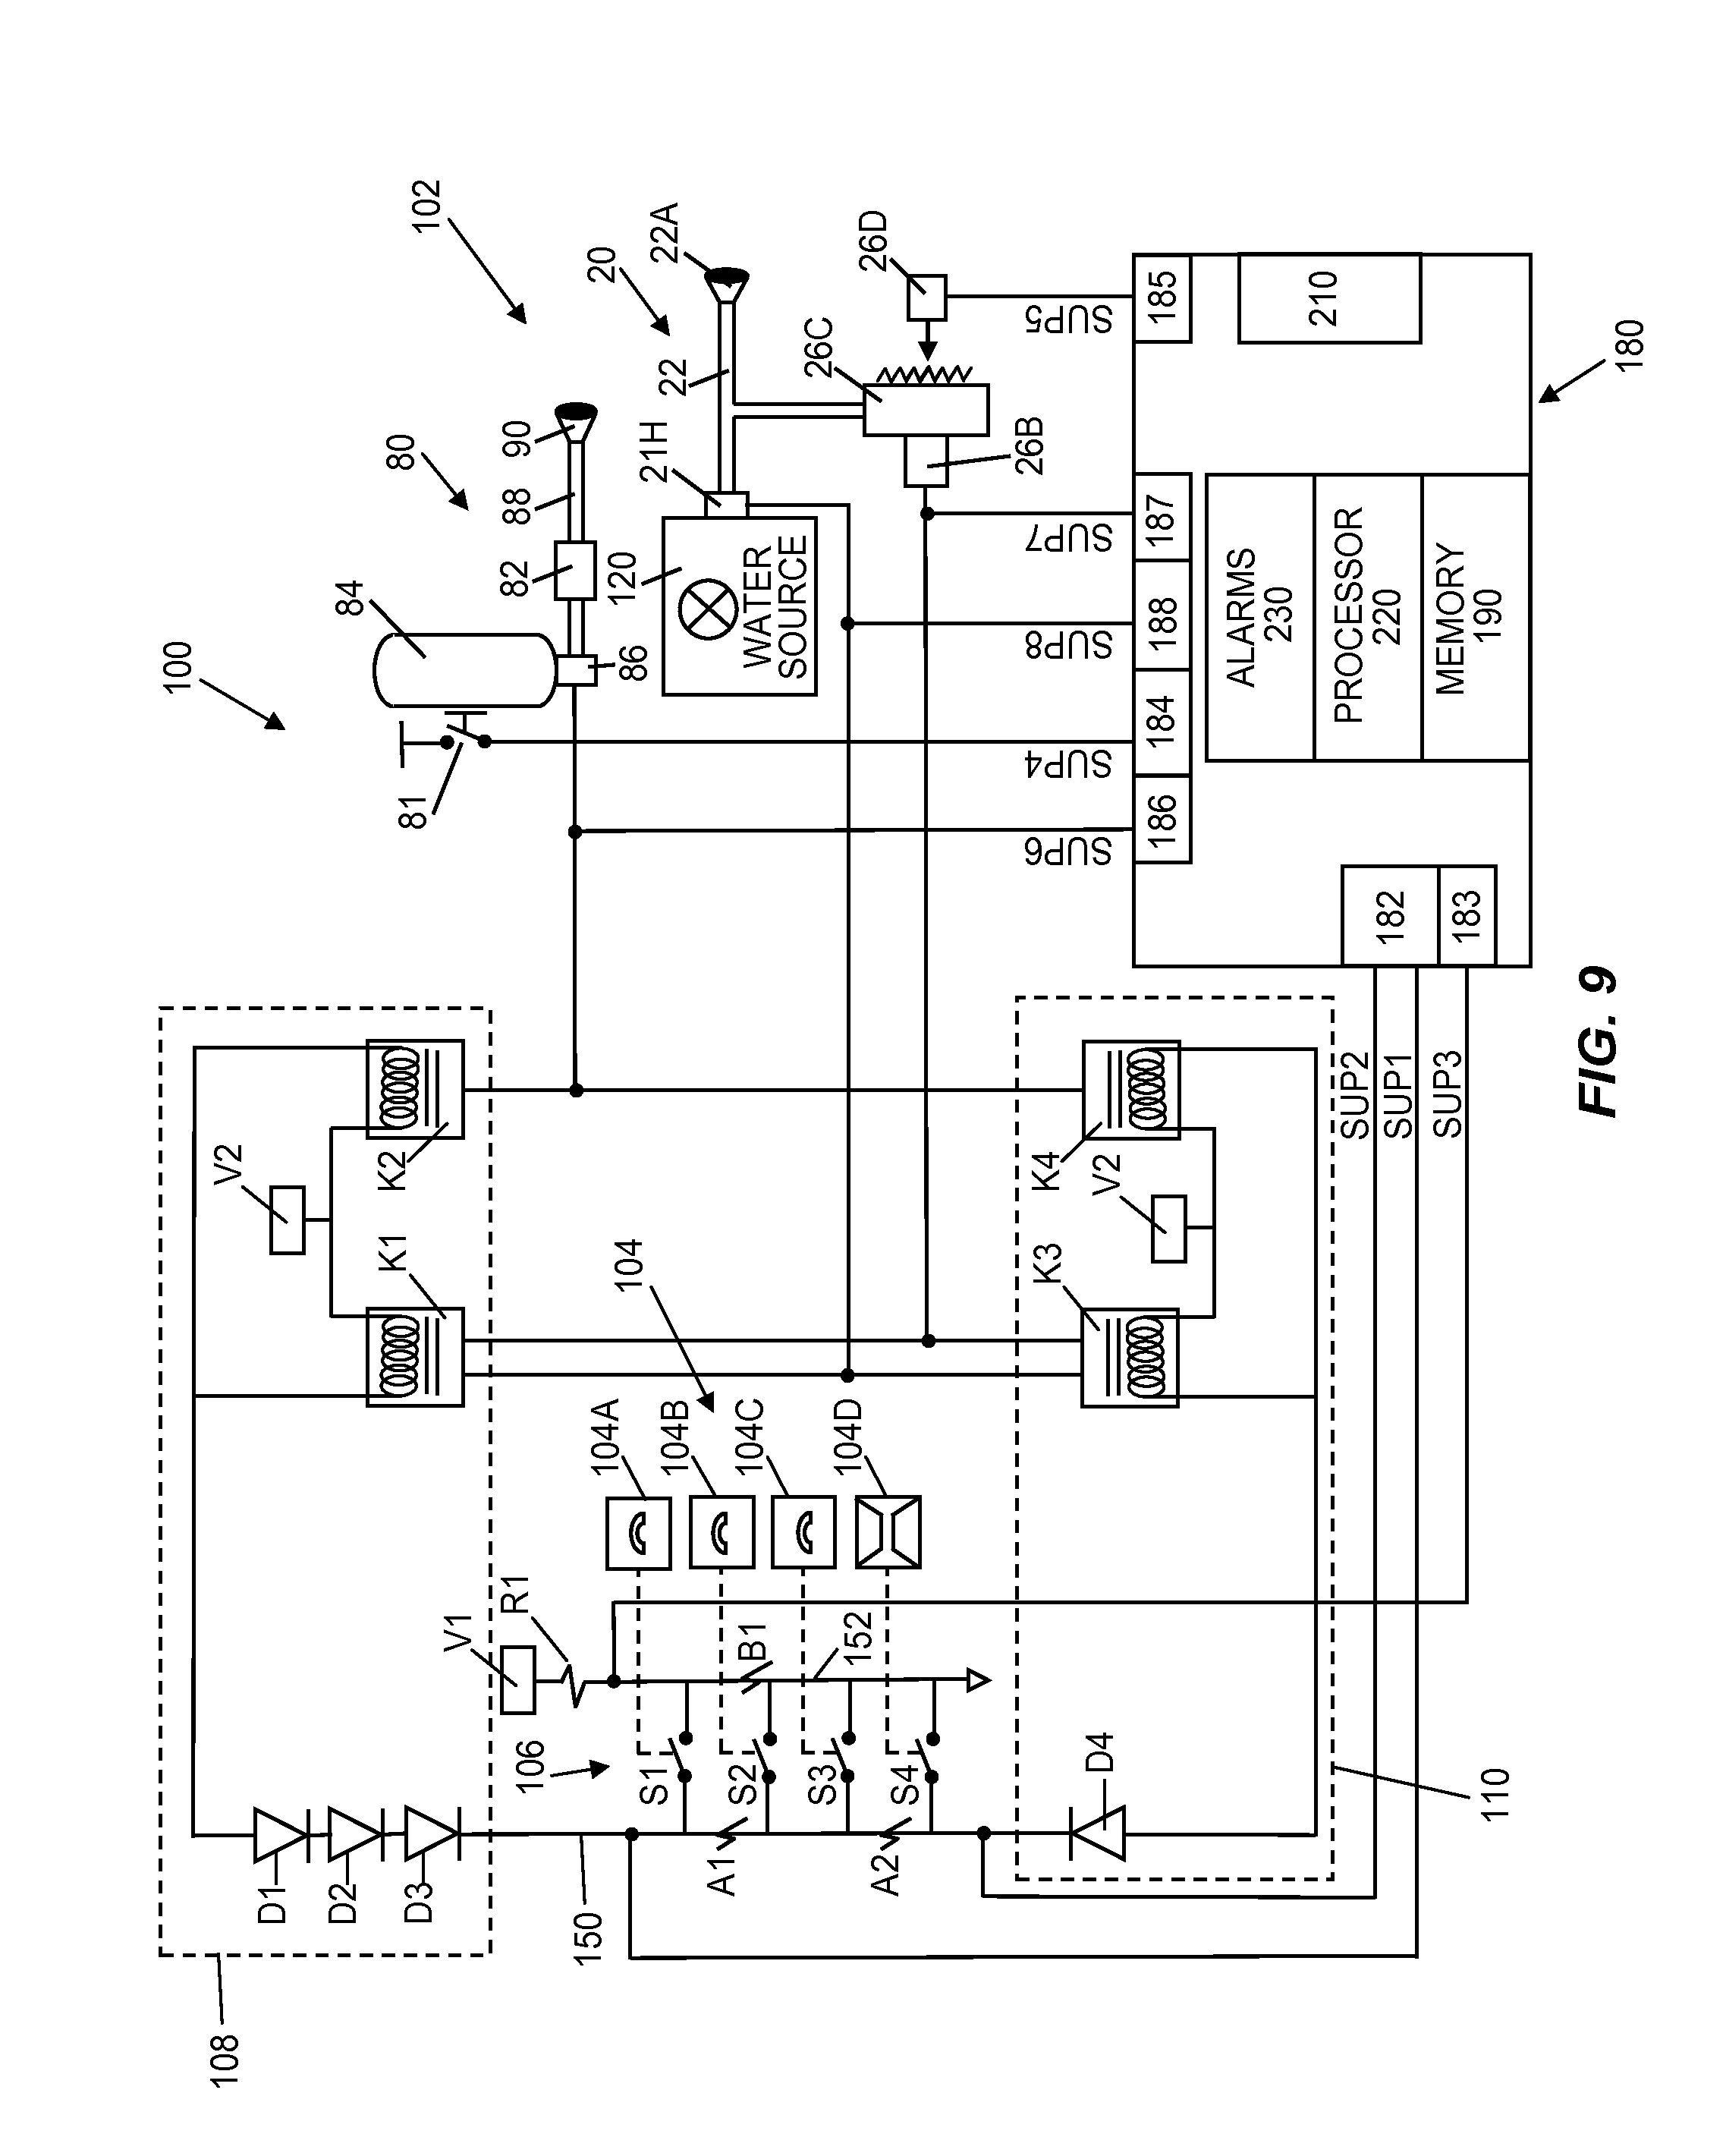 [DIAGRAM] 94 Saab Wiring Diagram